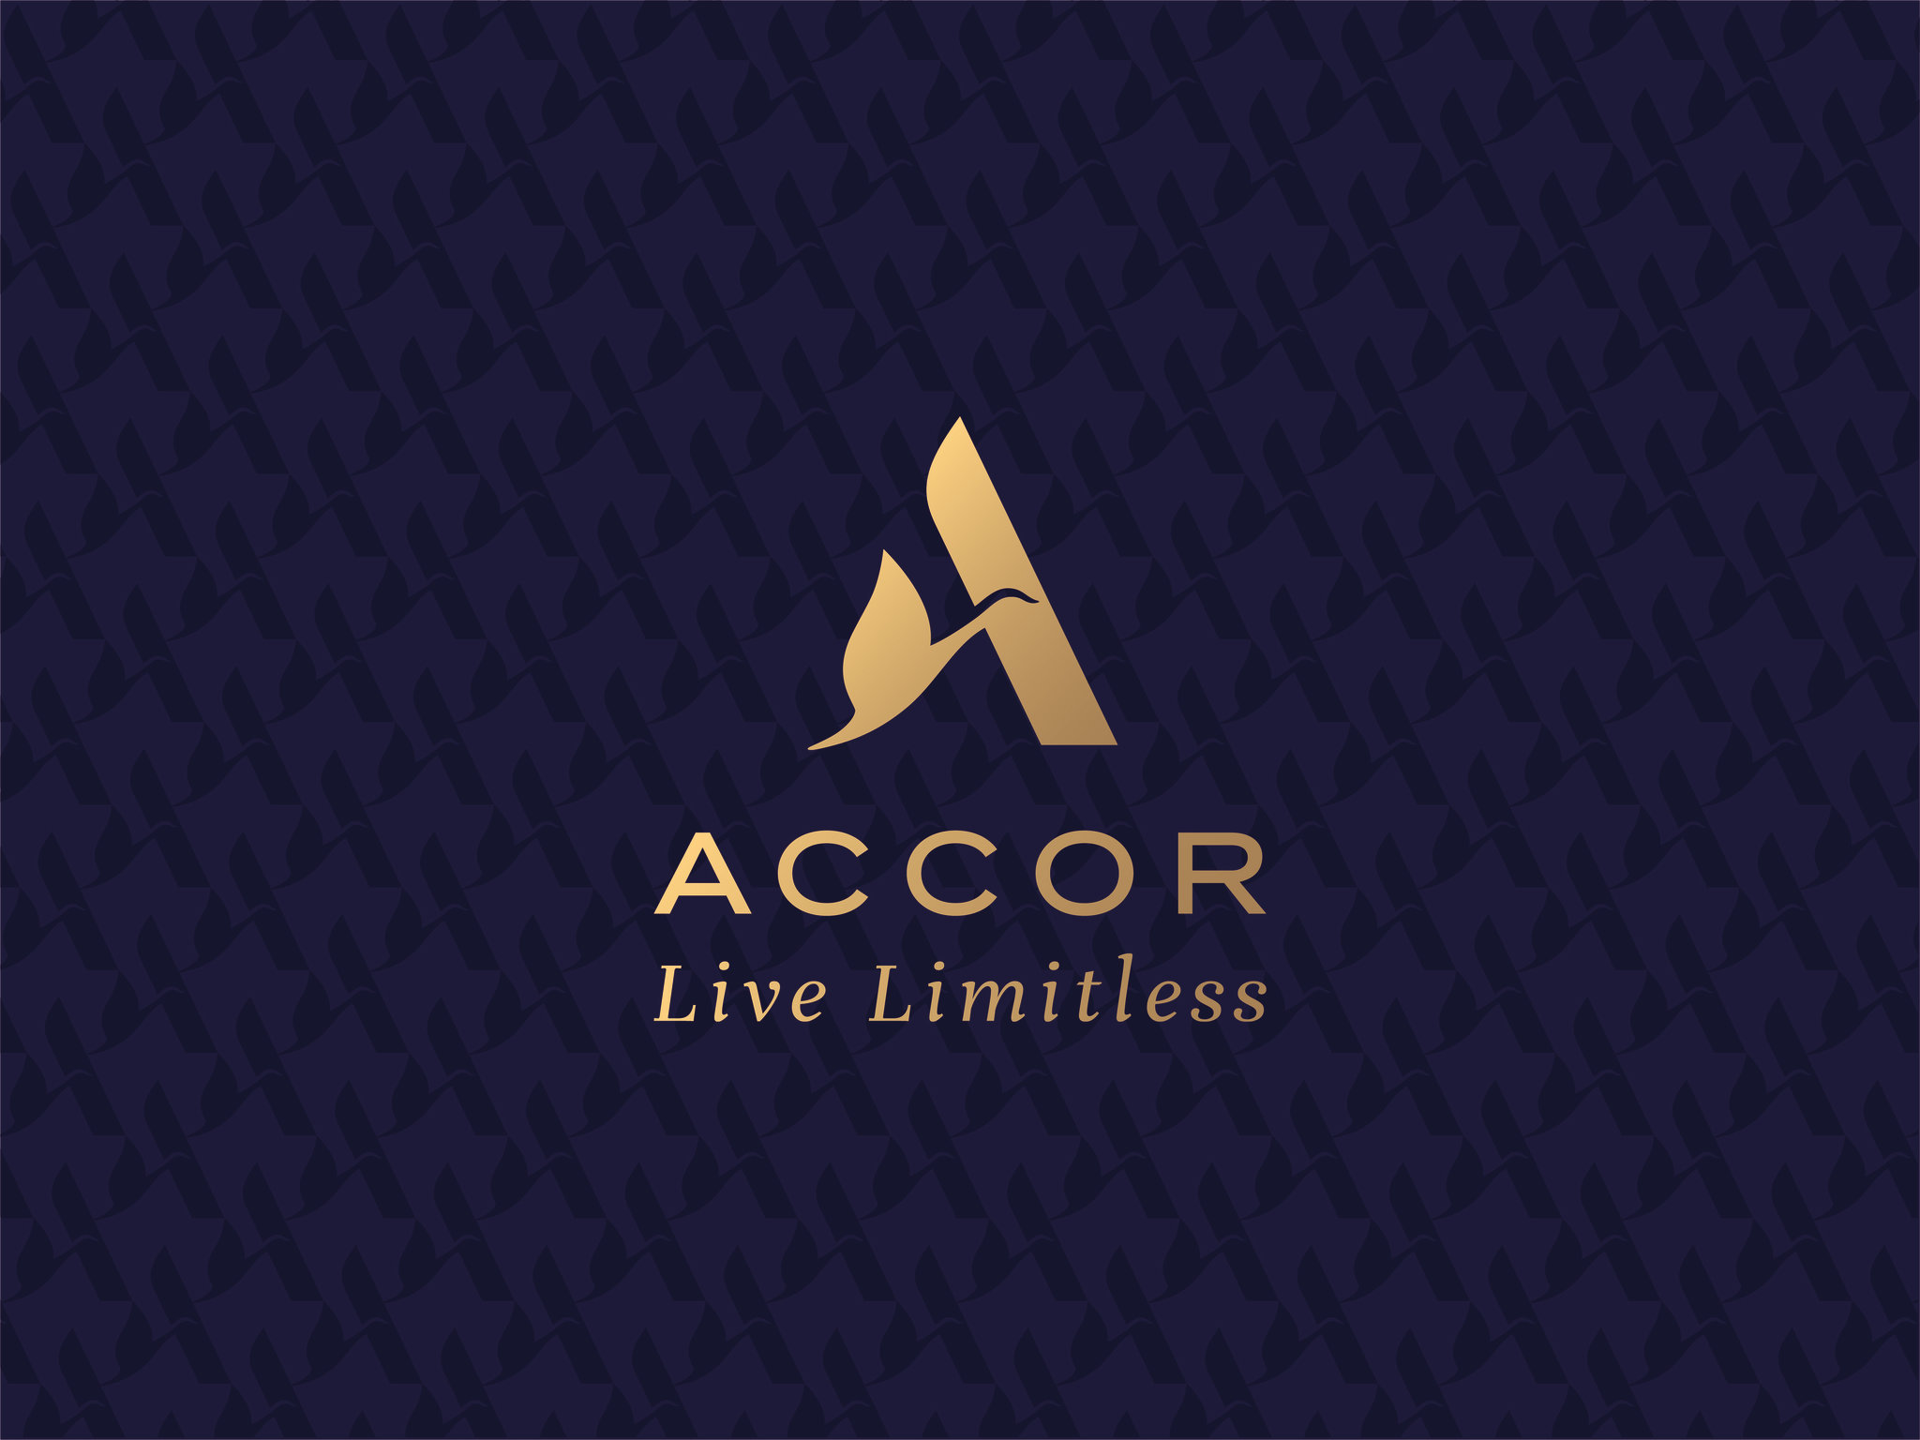 Accor logo rebrand